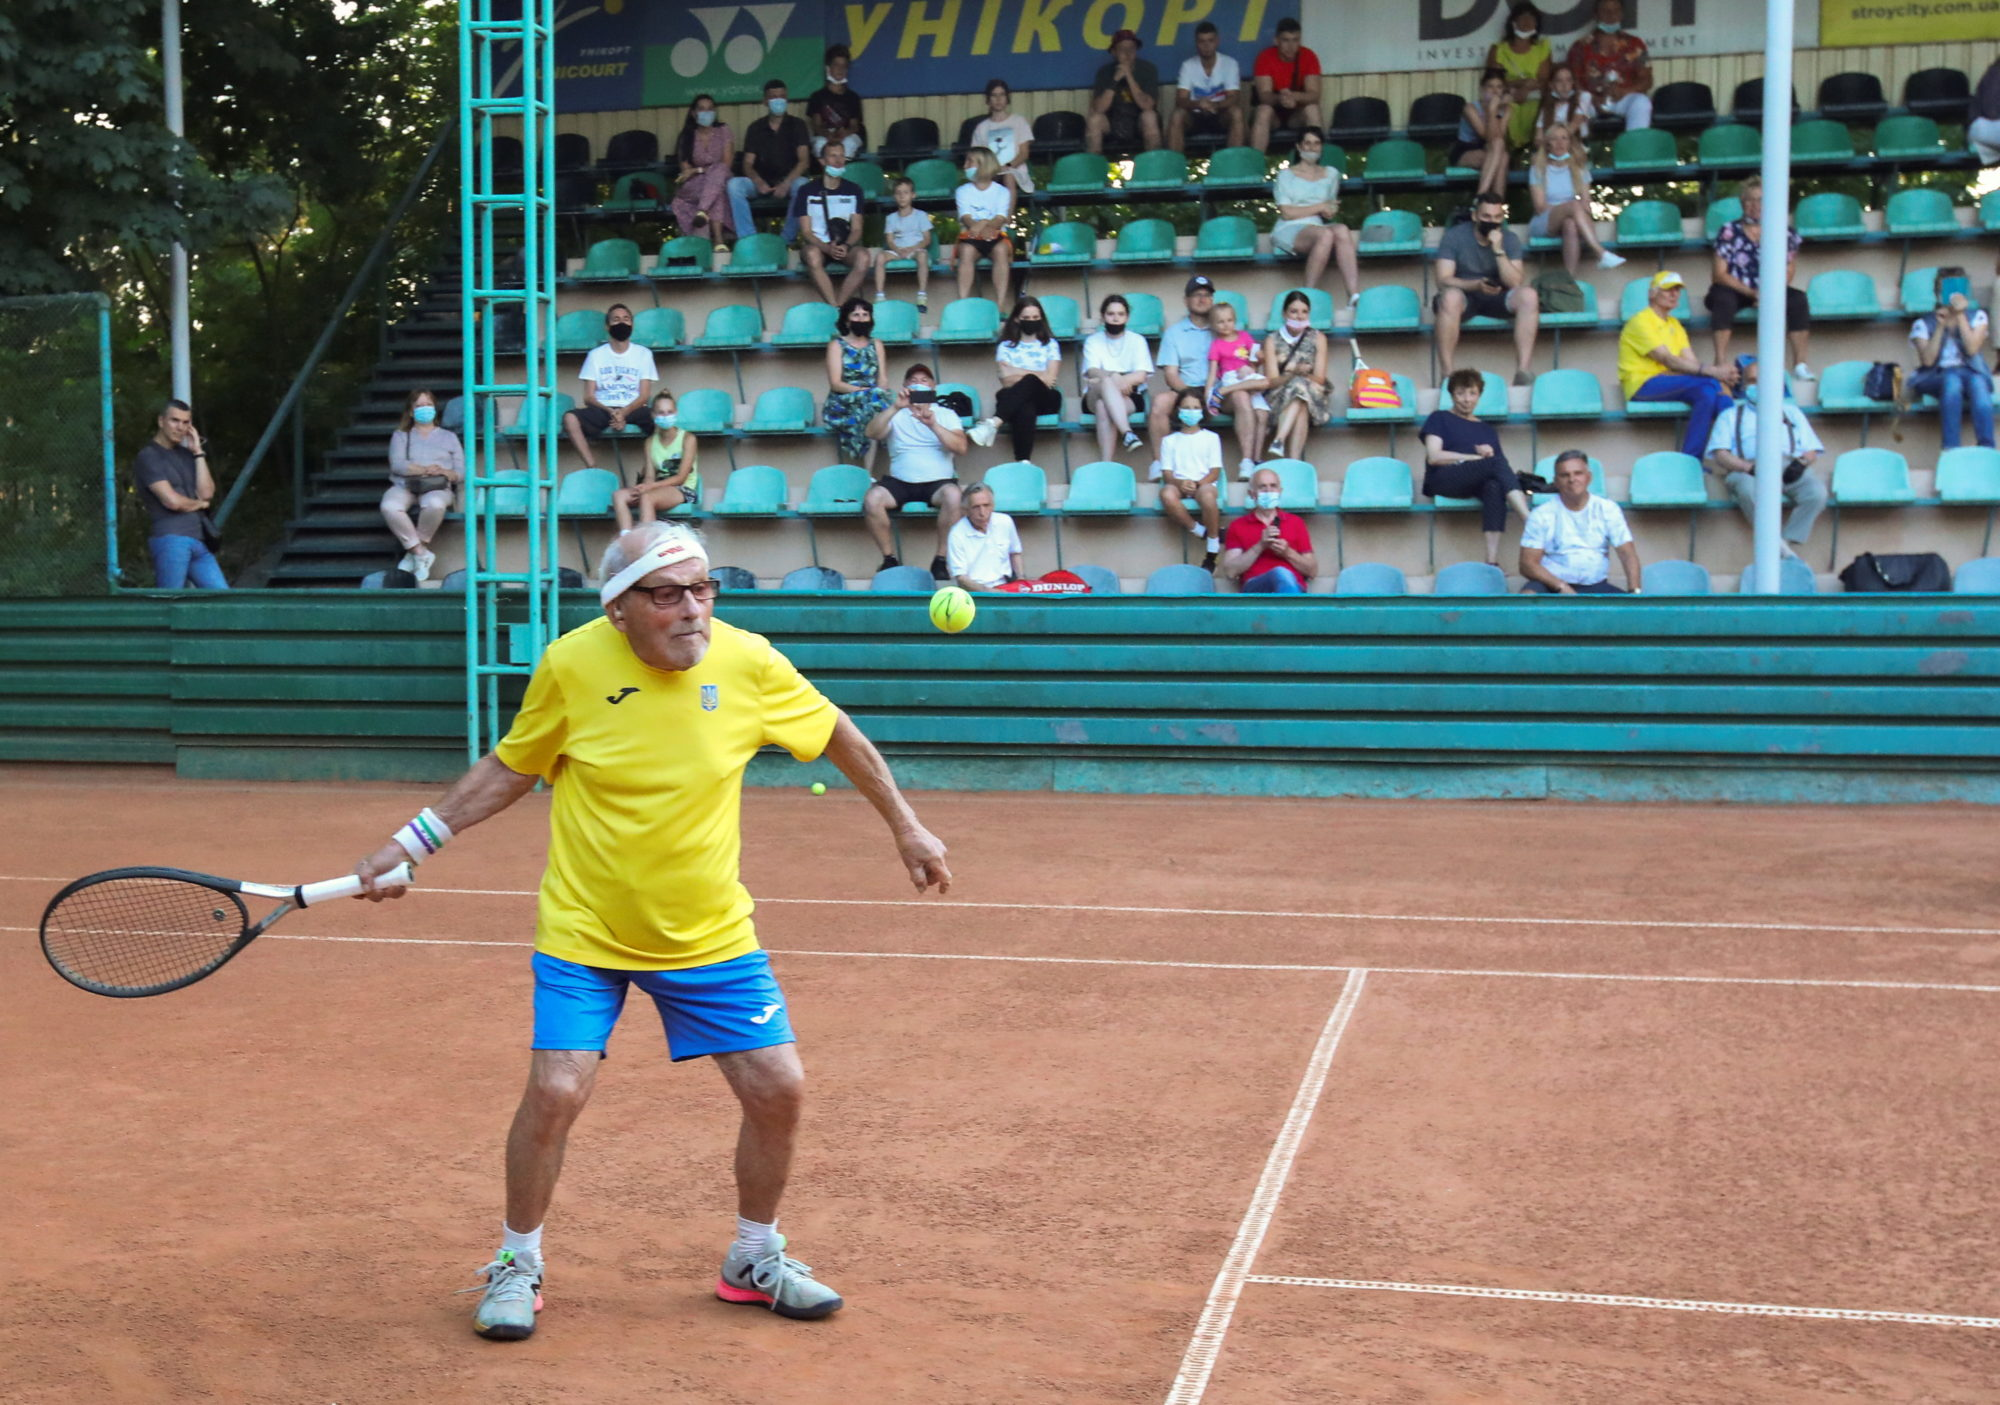 The world's oldest tennis player Ukrainian Stanislavskyi, 97, practices on court in Kharkiv